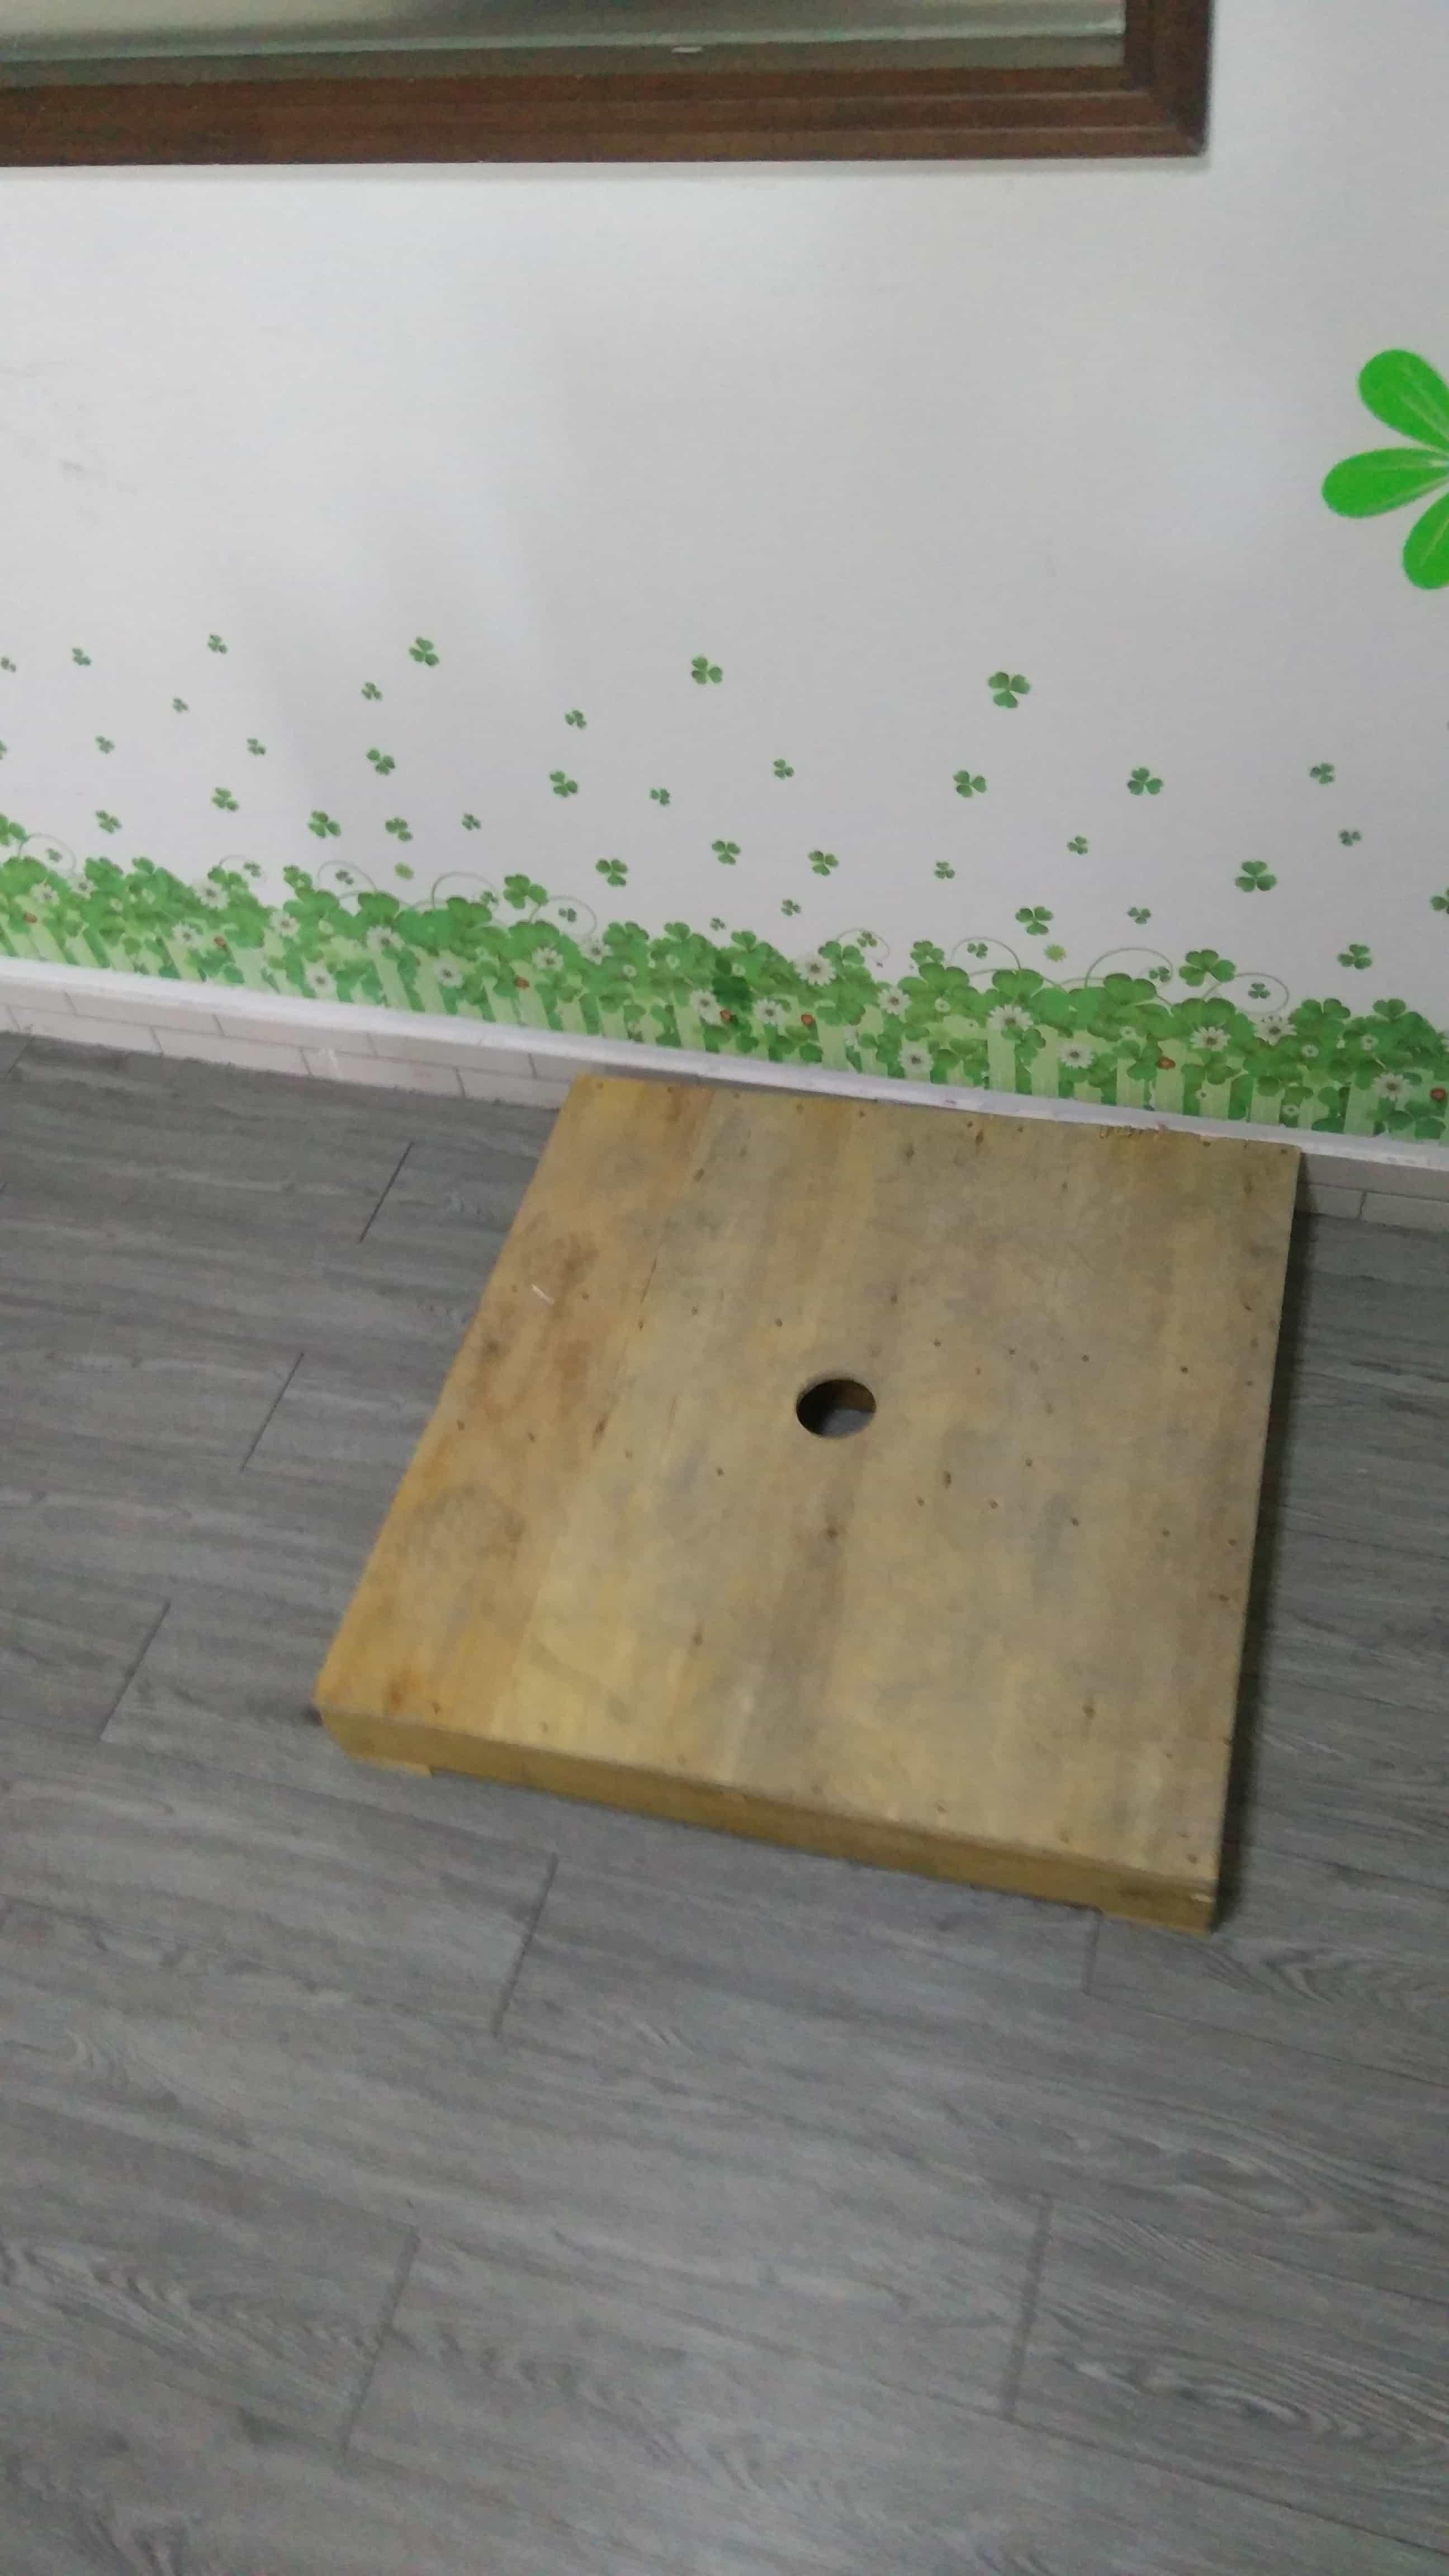 垫脚板木厂家-垫脚板木厂家、公司、?,☜ぐろ?业